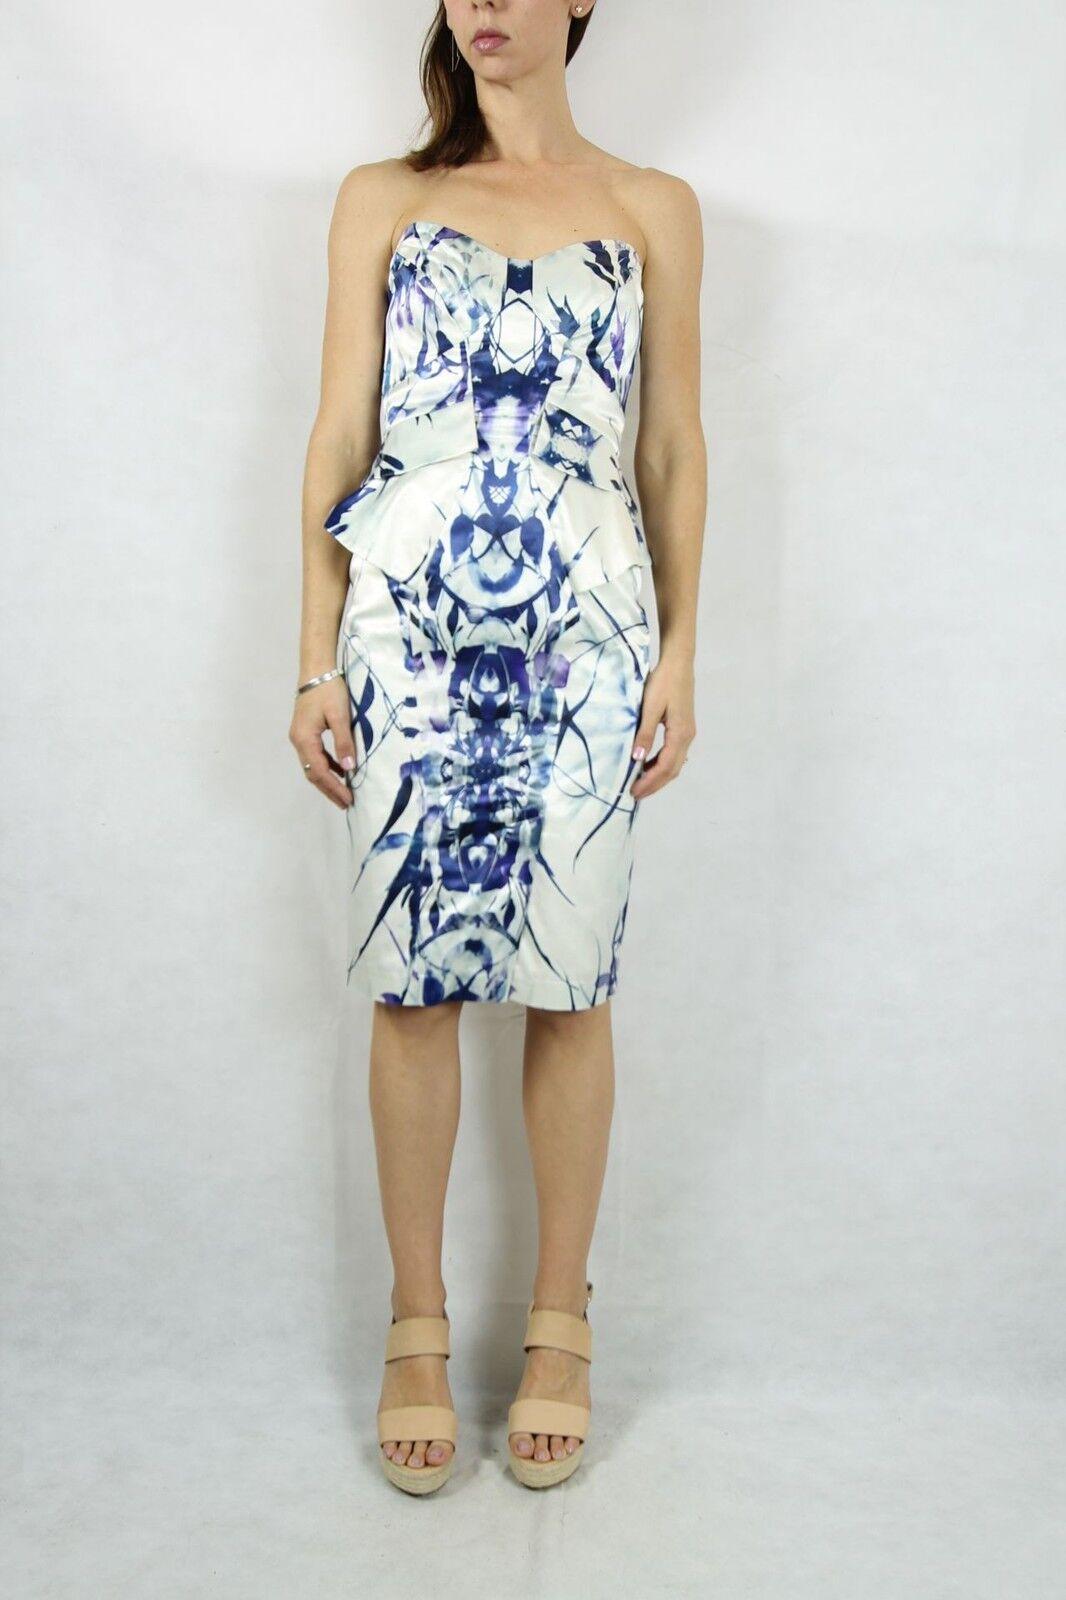 CUE CUE CUE White Digital Print Strapless Peplum Dress Size 10 1a29ea